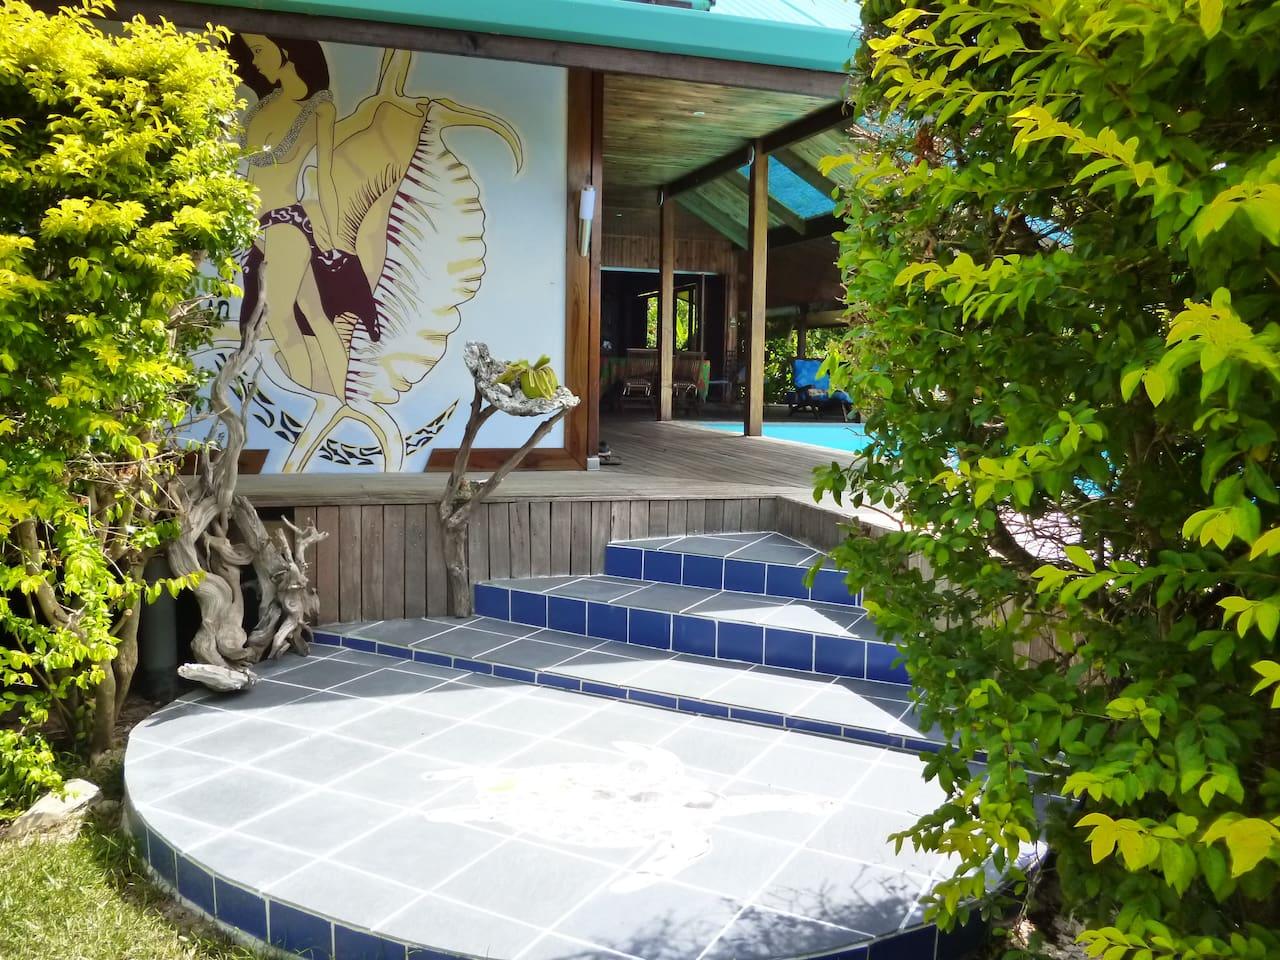 Villa U Upa Chambre Double Bed And Breakfasts En Renta En